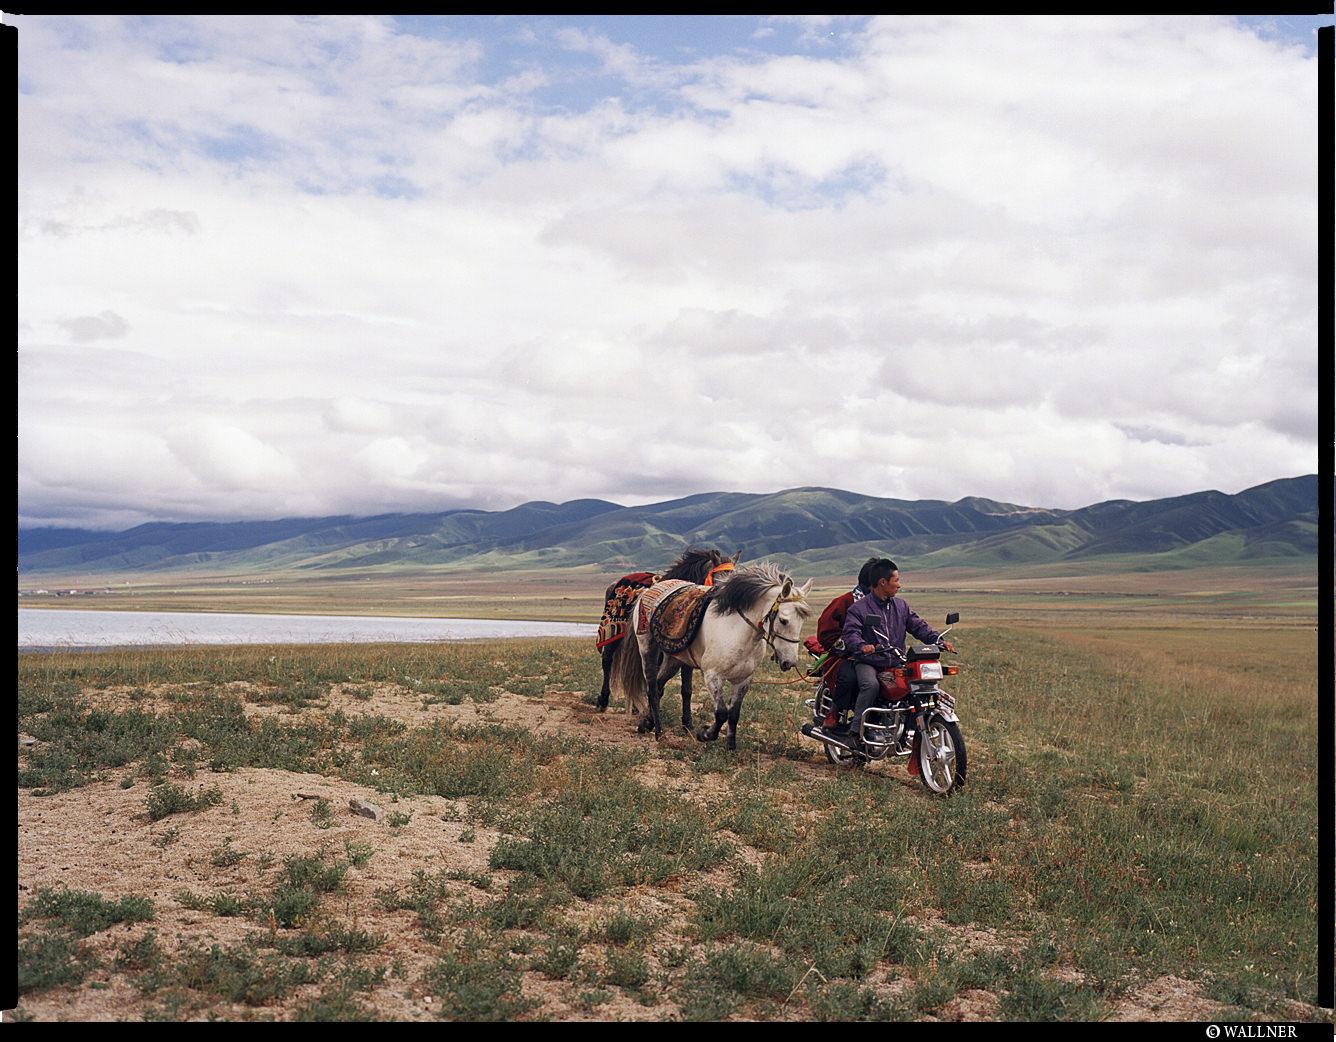 MediumFormatPatrikWallner_Qinghai_HorseNotAsUsefulAnymoreLOWQ